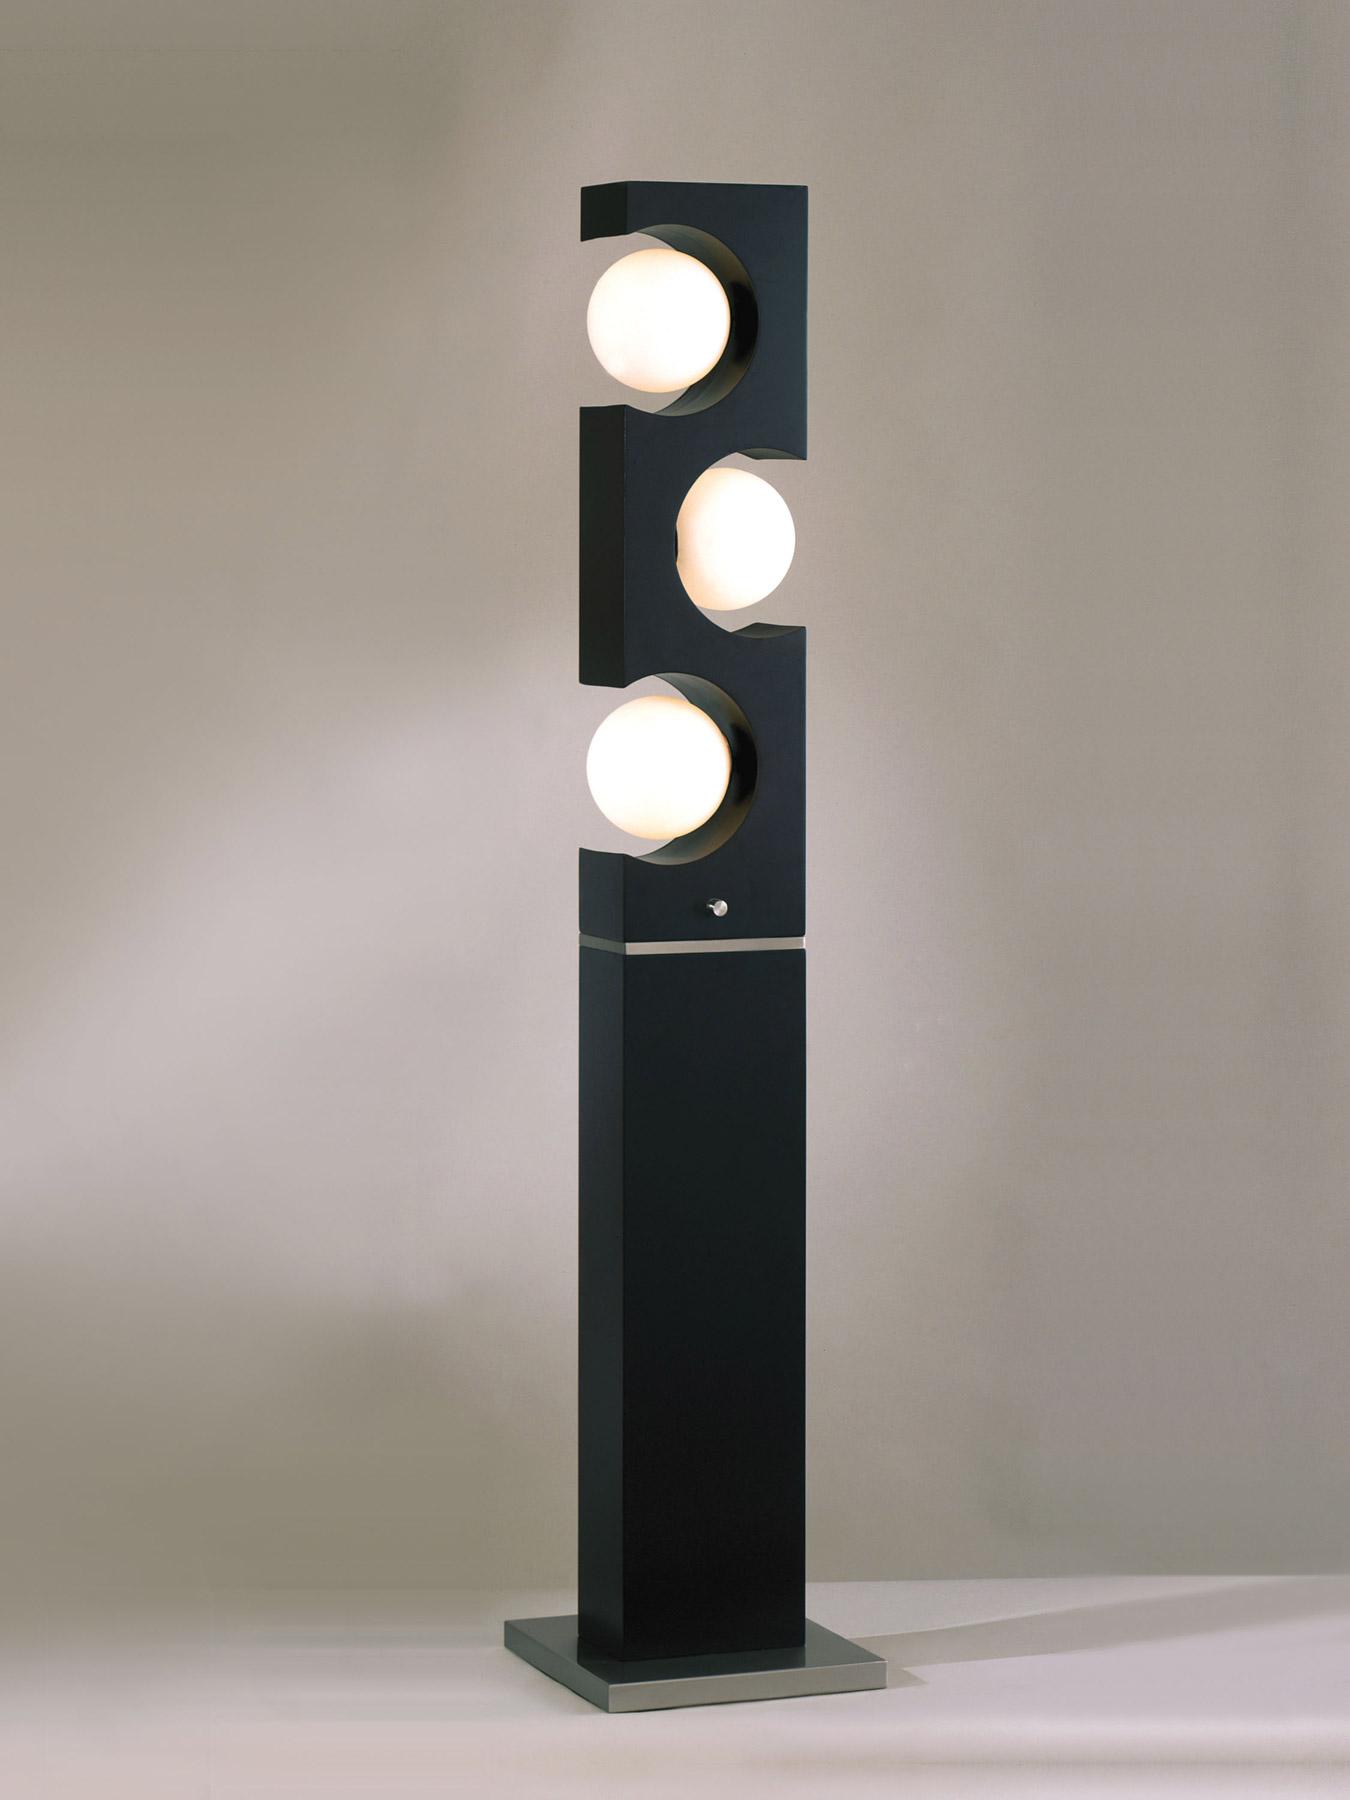 Nova Lighting 2343 Nova 1960 Floor Lamp